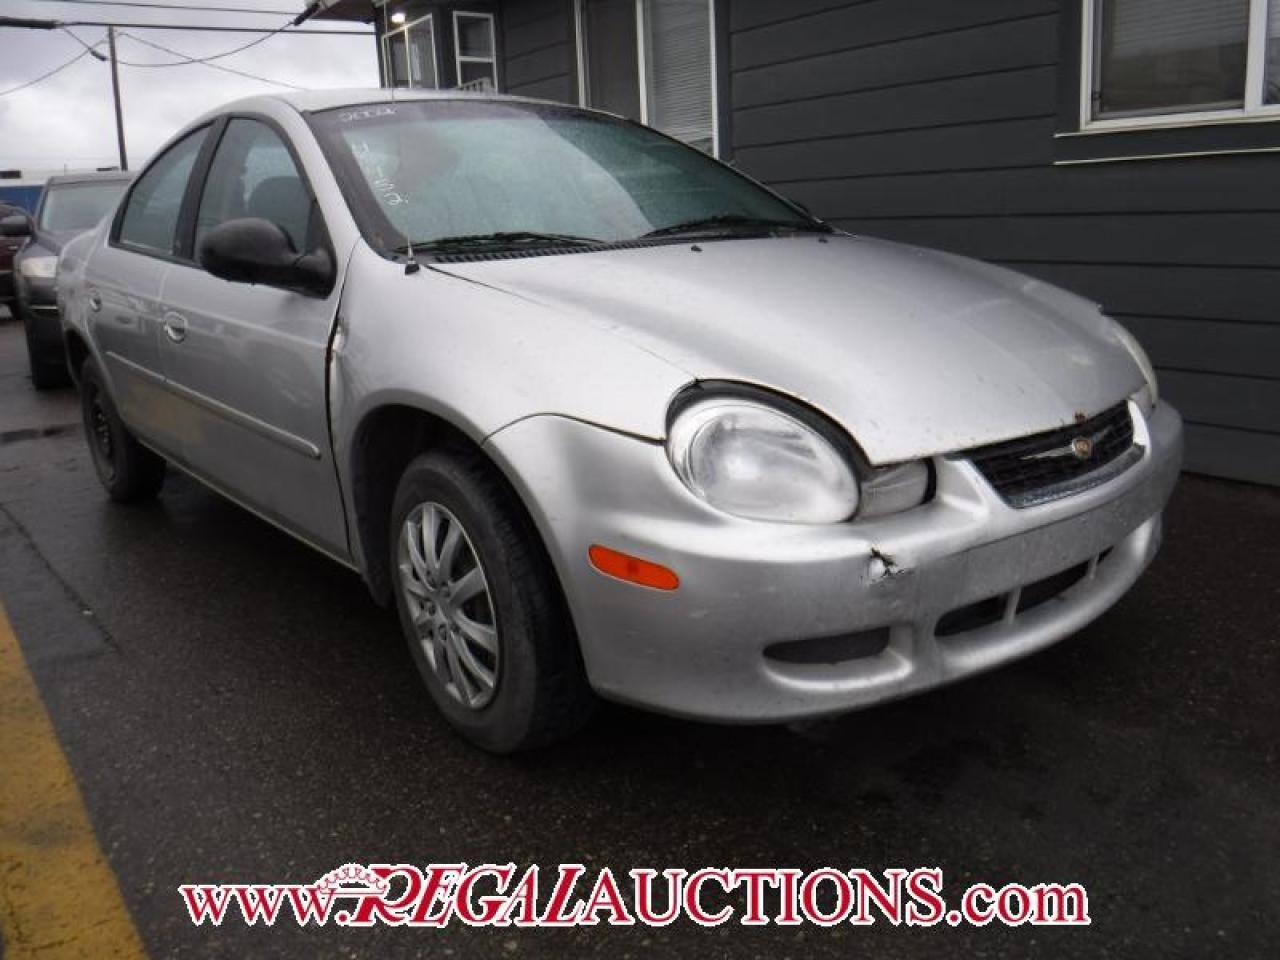 Photo of Silver 2002 Chrysler Neon